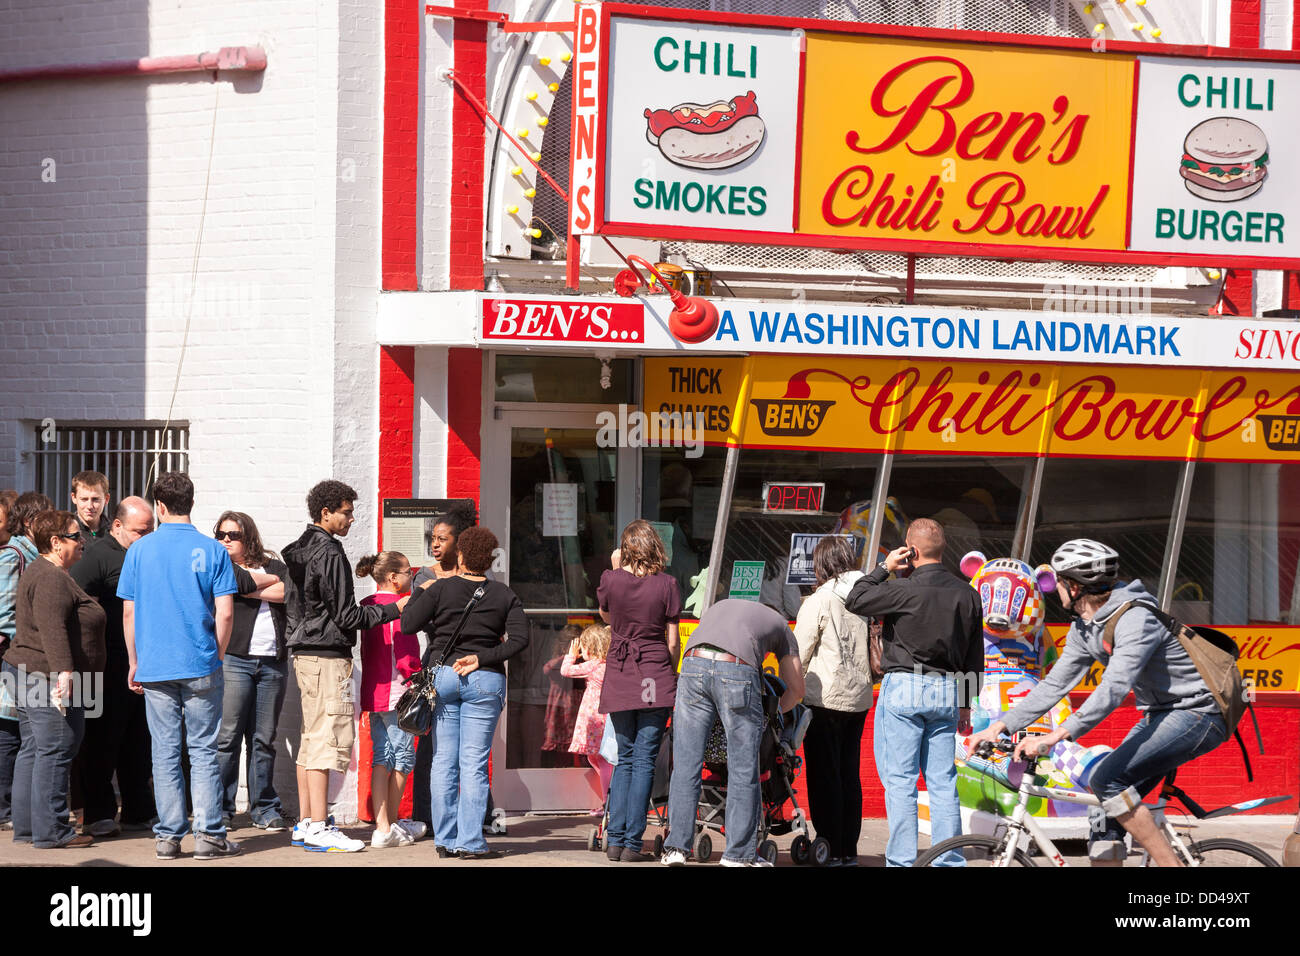 Ben's Chili Bowl landmark diner restaurant in U Street Corridor NW Washington DC. Founded in 1958. - Stock Image